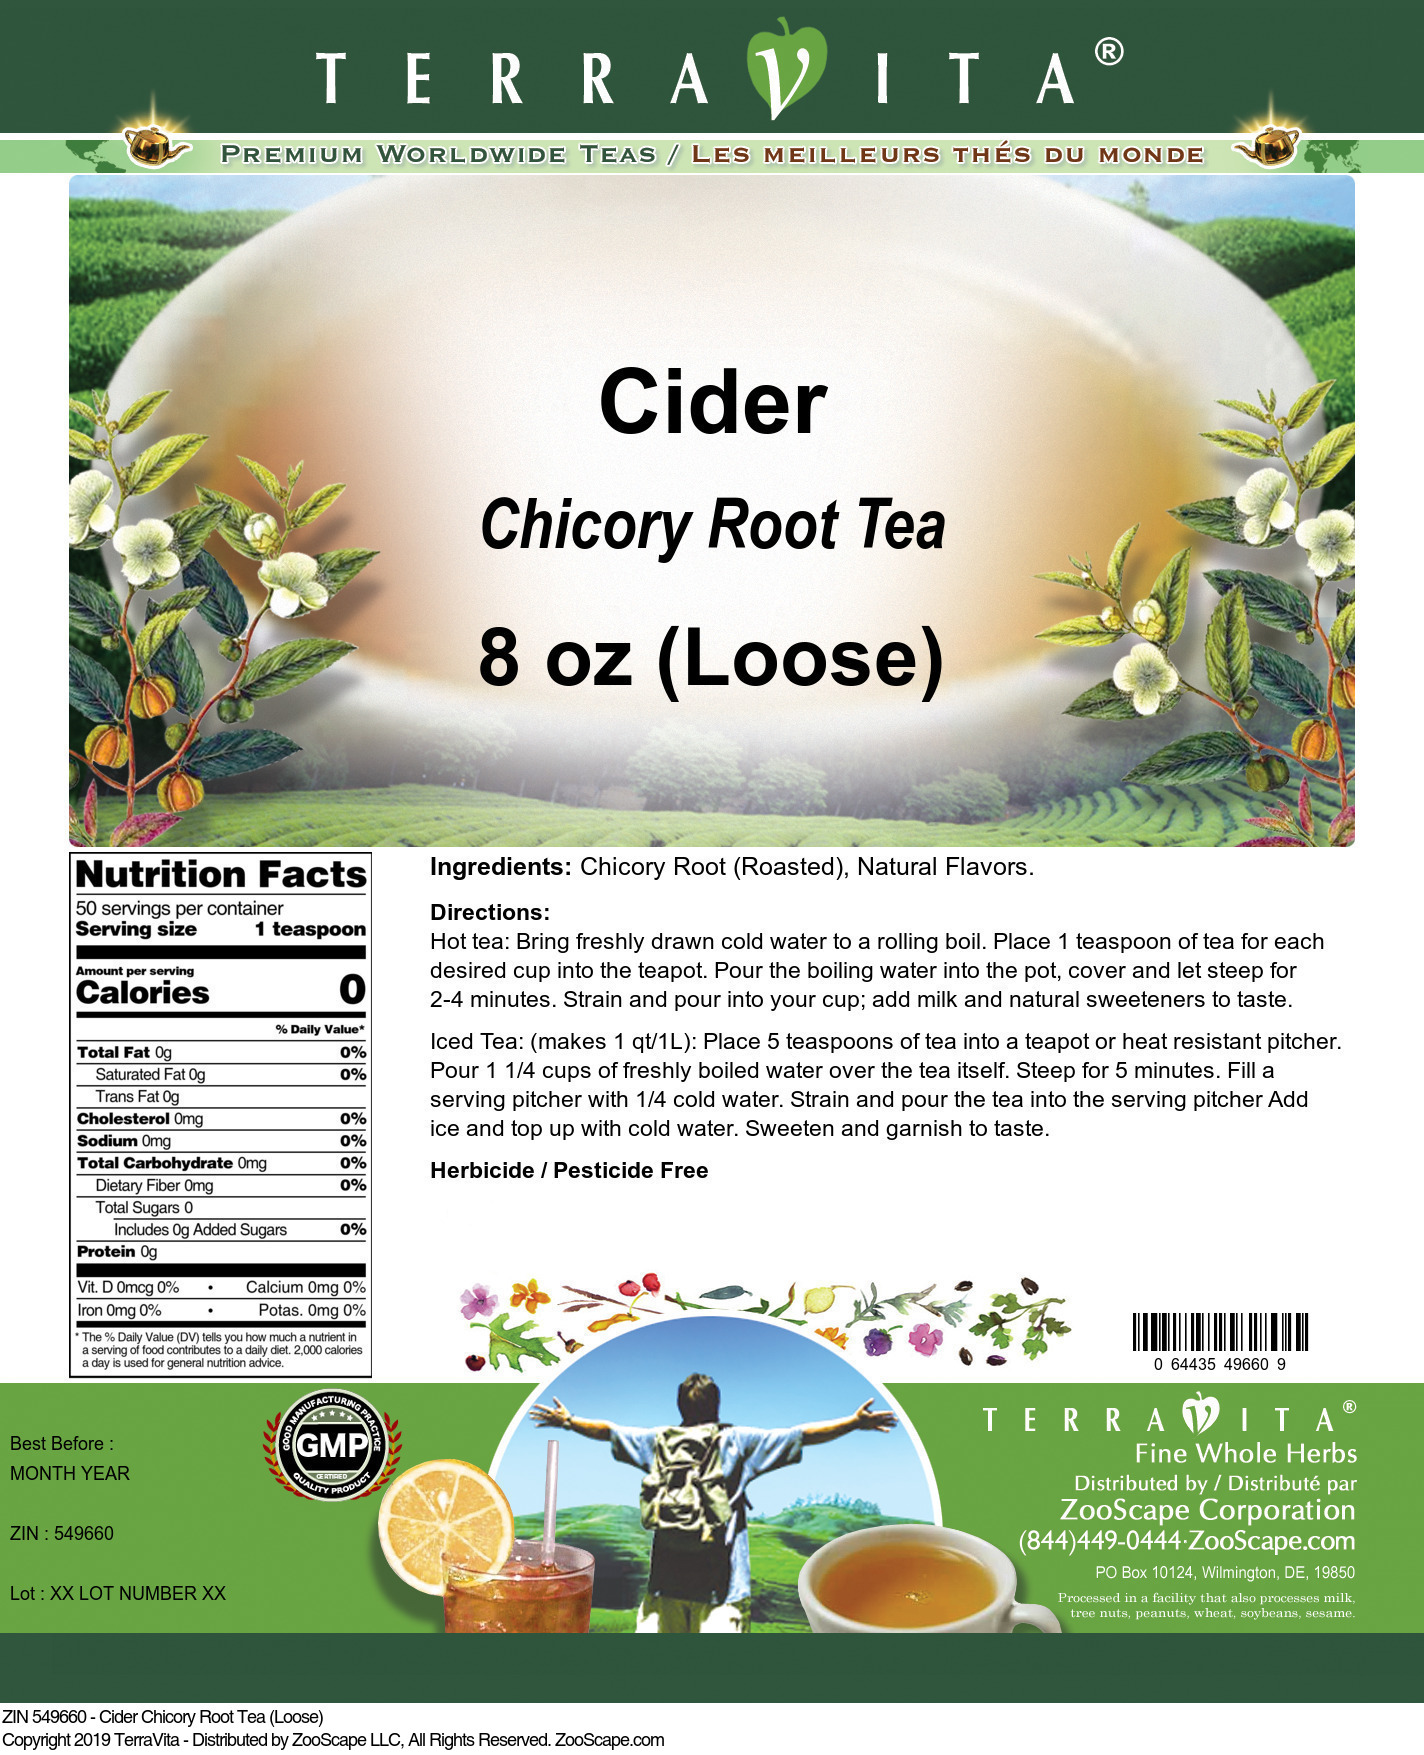 Cider Chicory Root